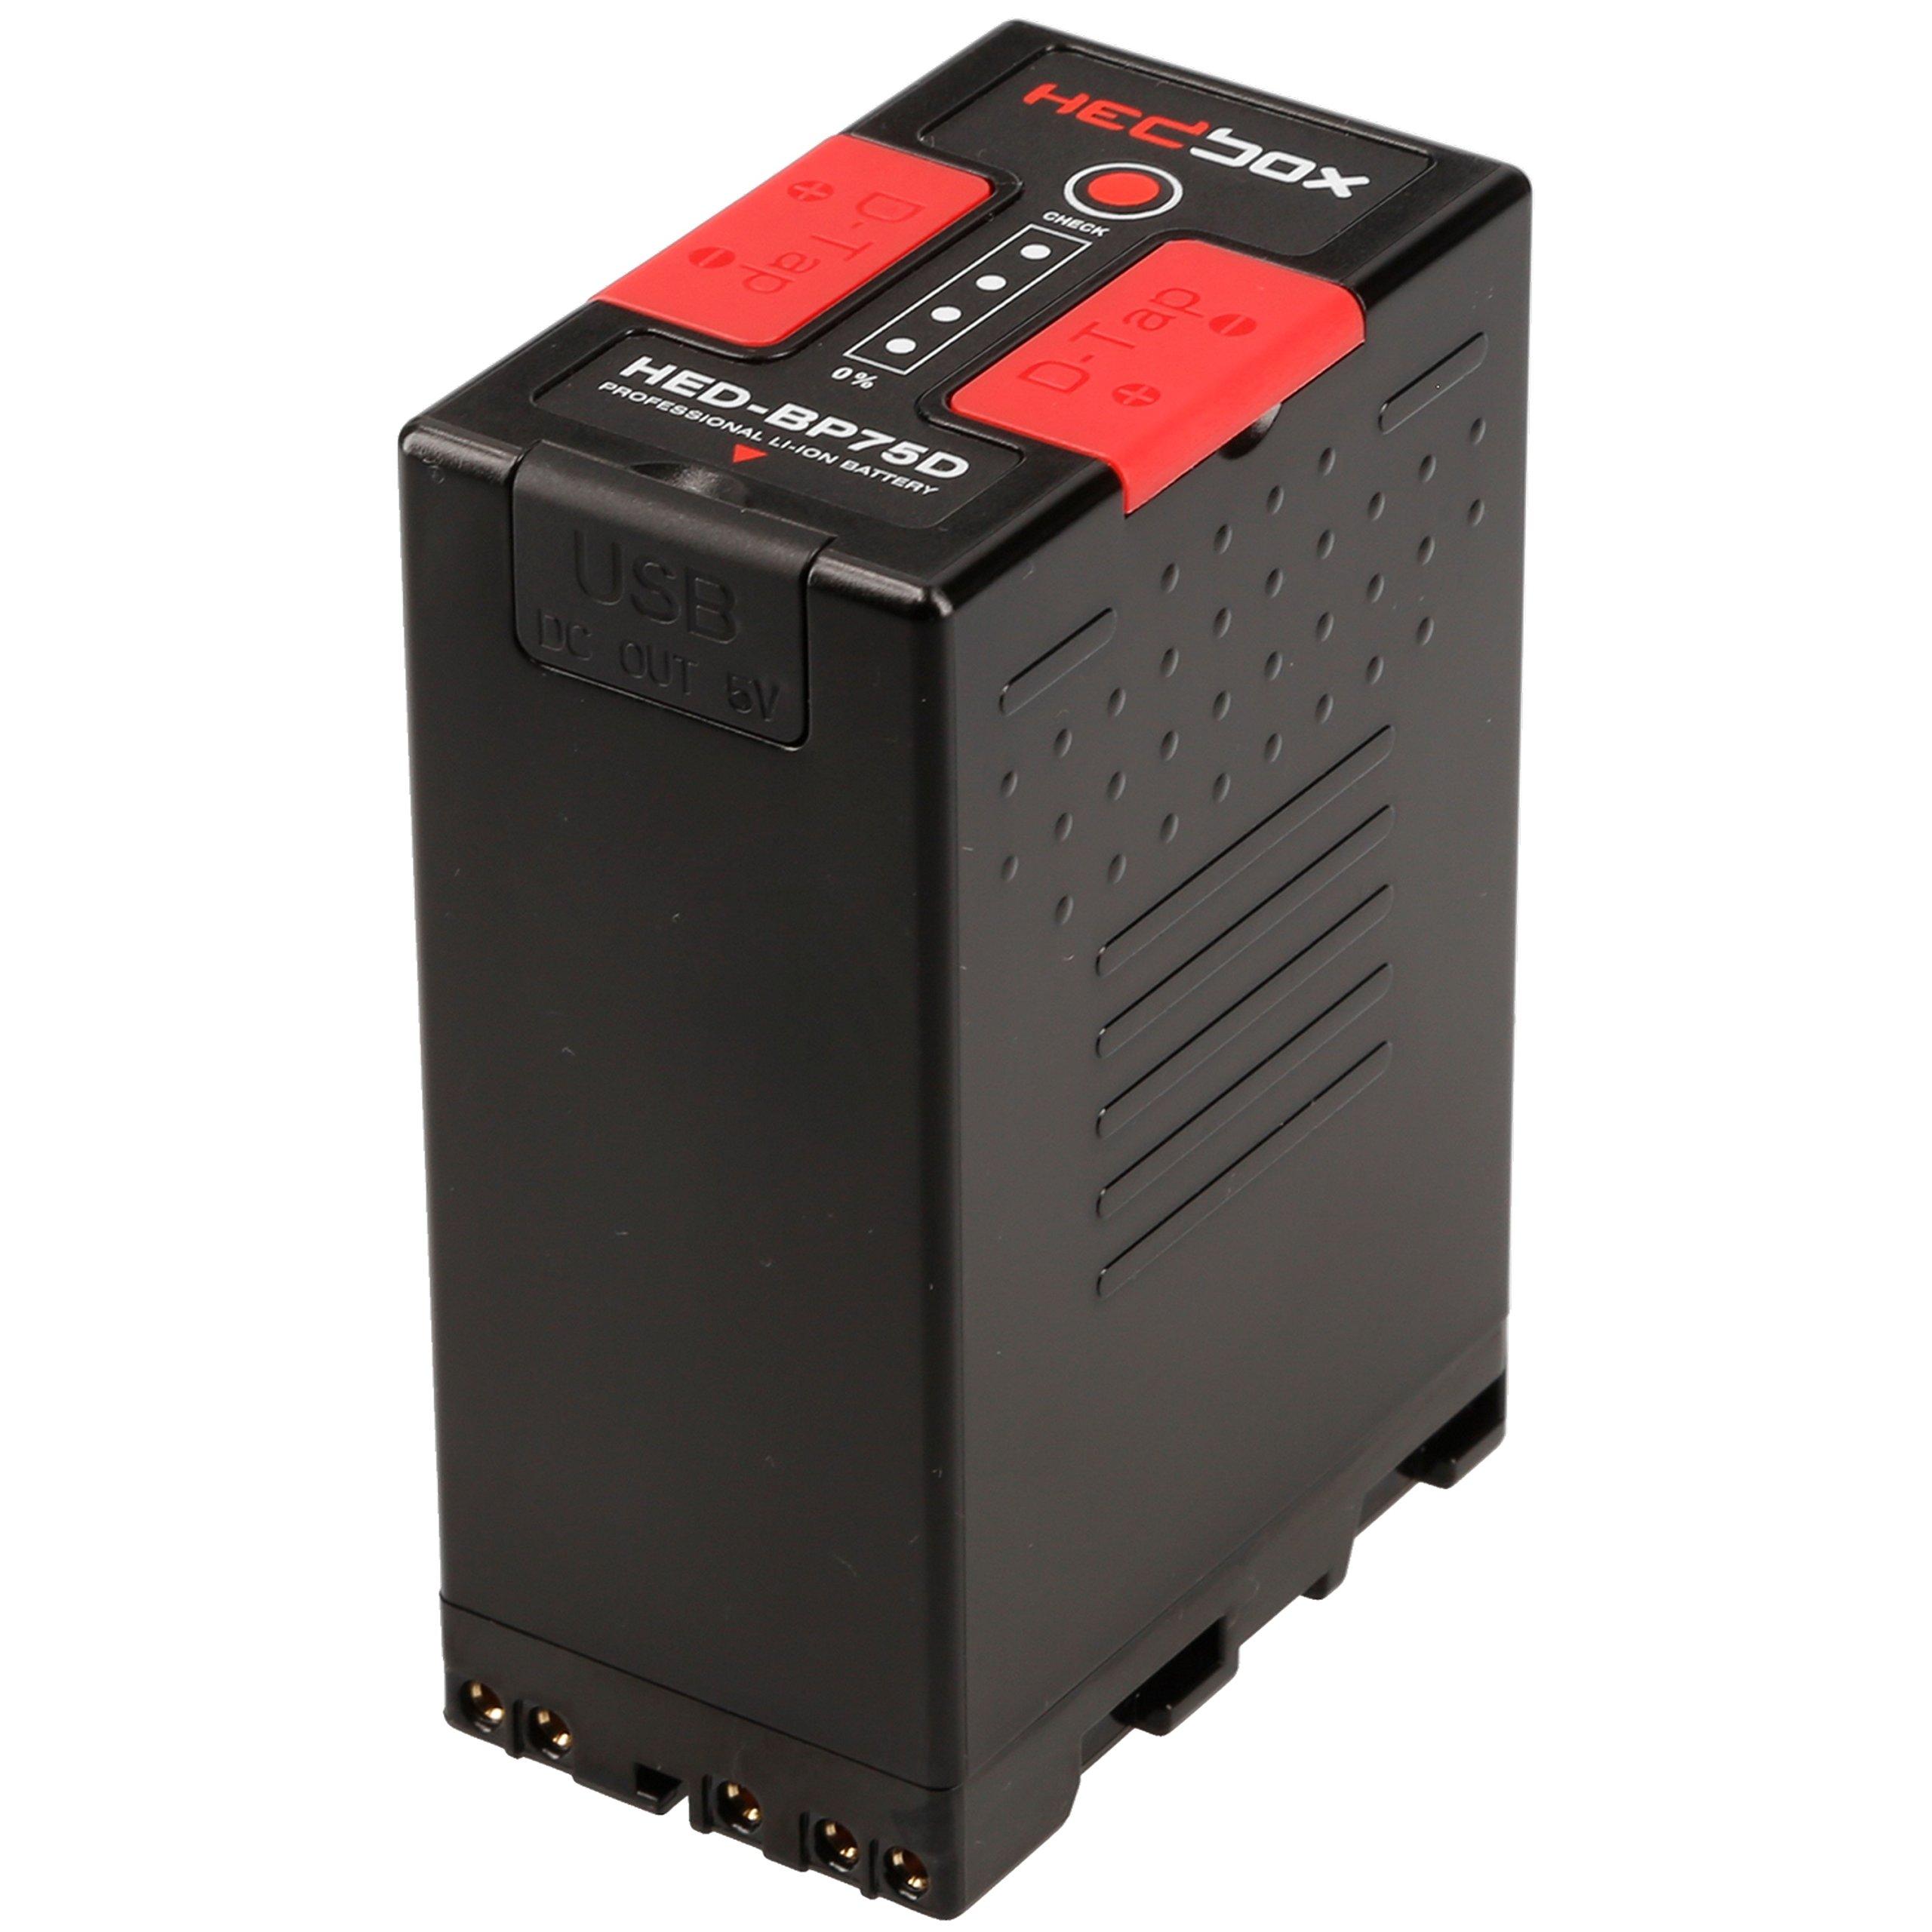 Hedbox HED-BP75D Sony BP-U Lithium-Ion High Capacity Battery Pack, 5200mAh